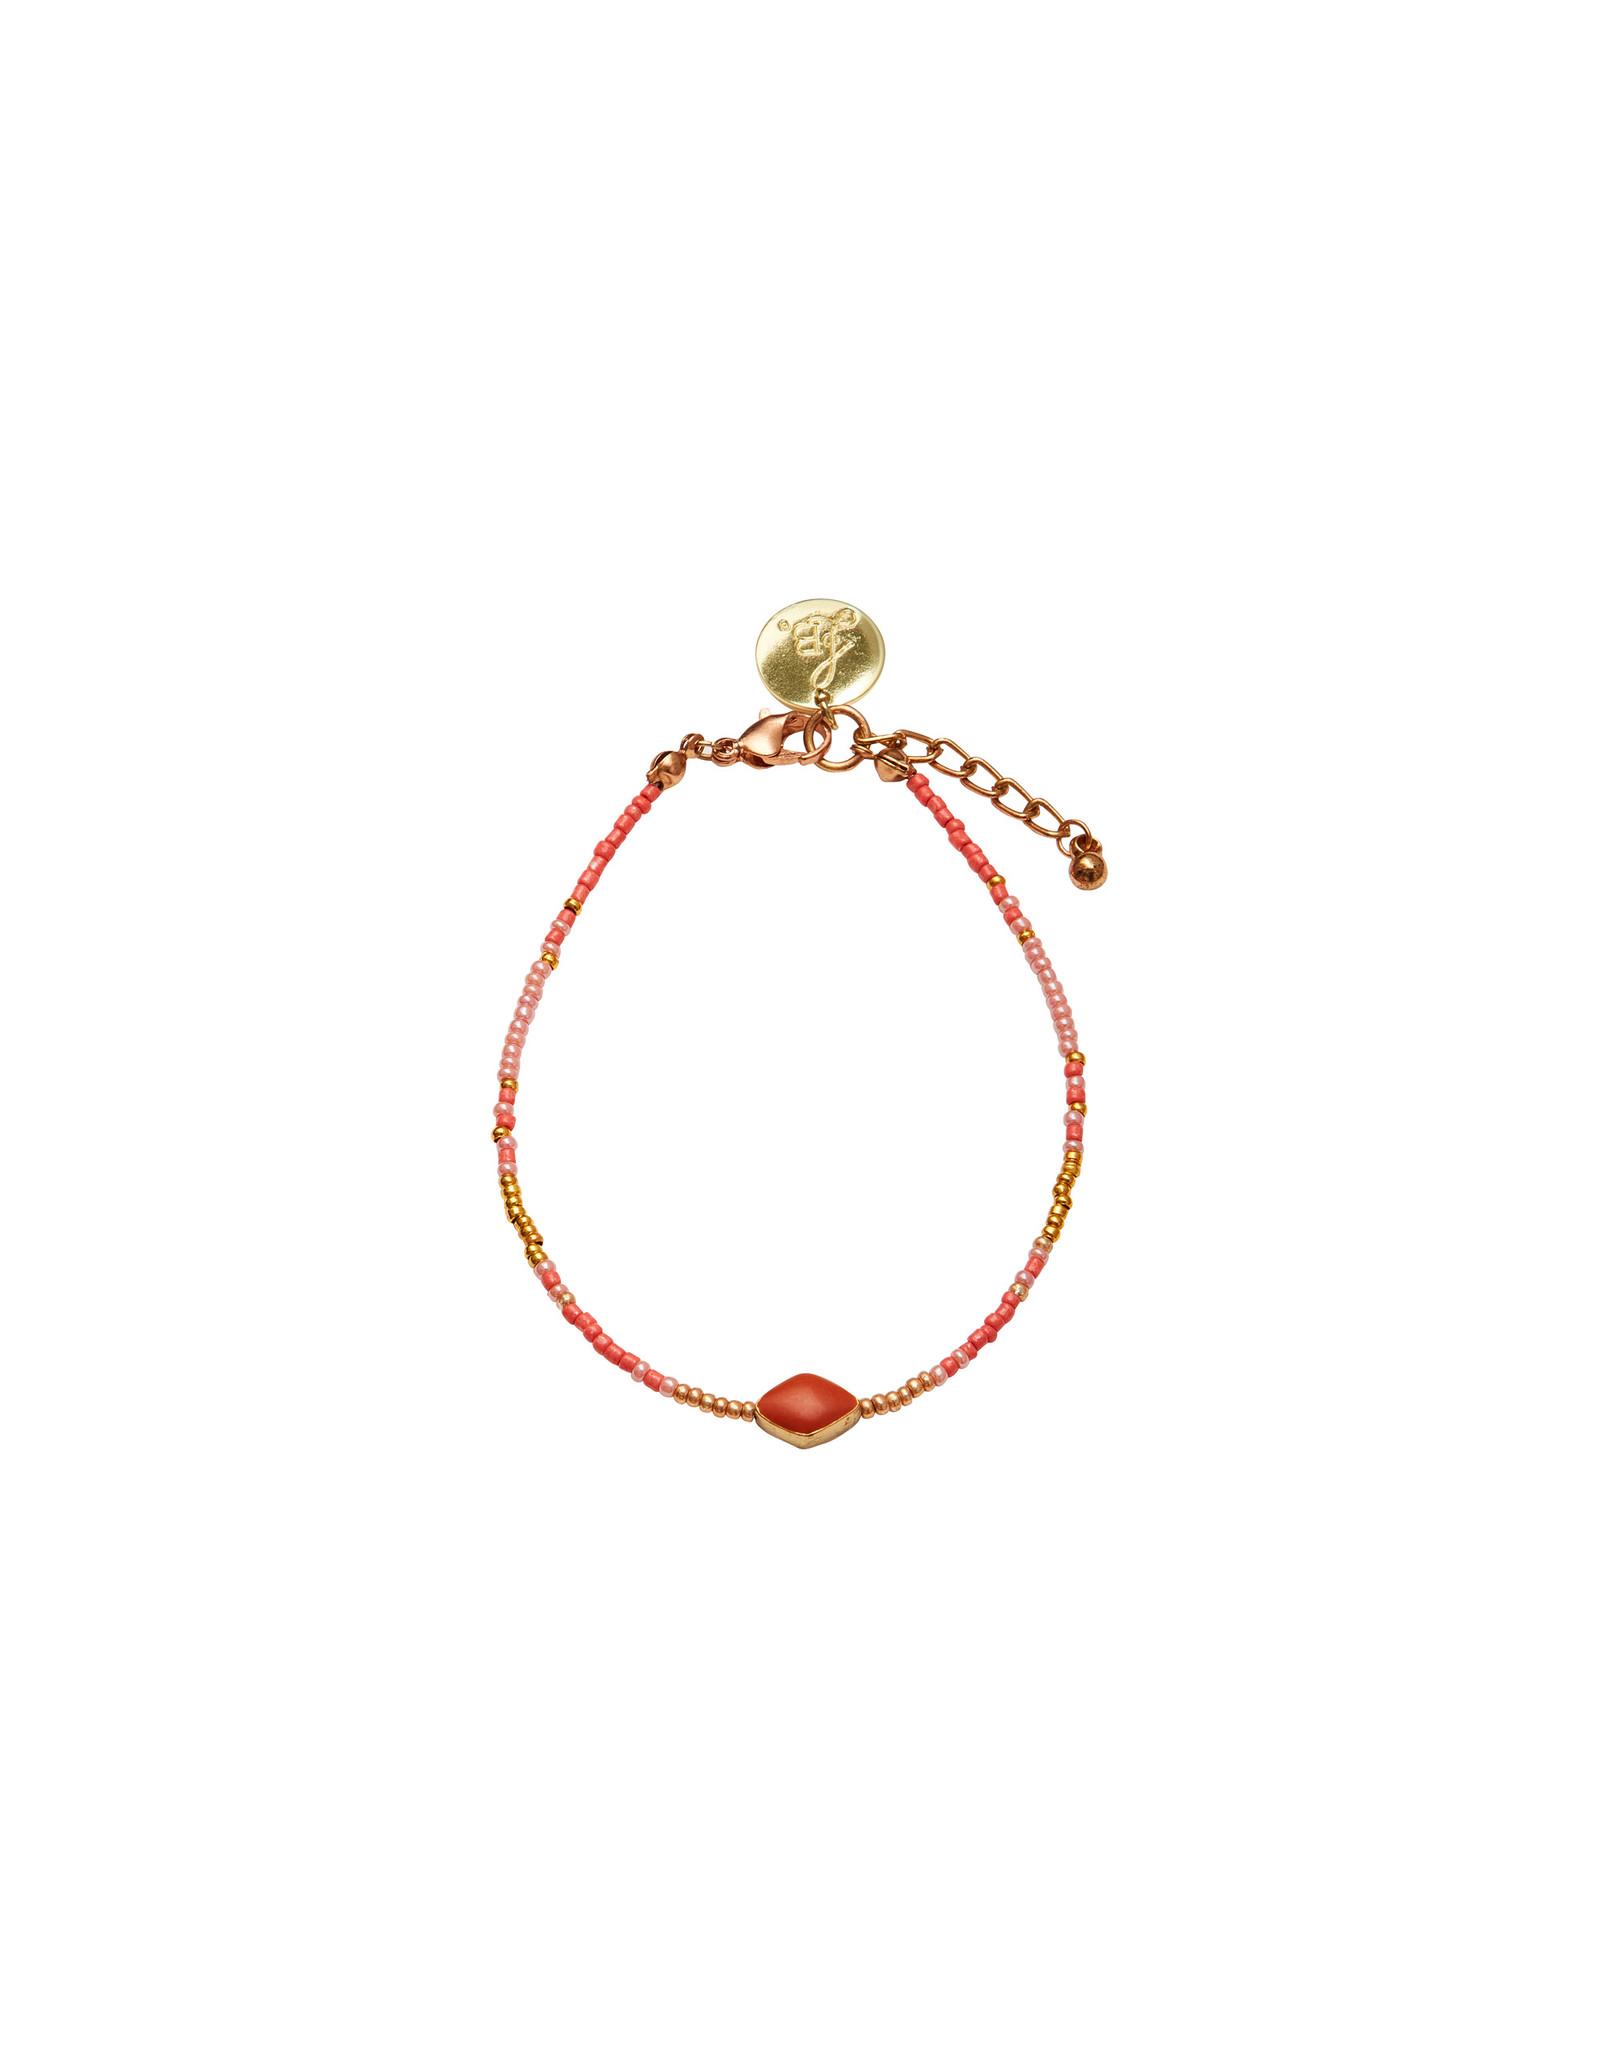 Bulu Bulu Happy Beads Anklets coral